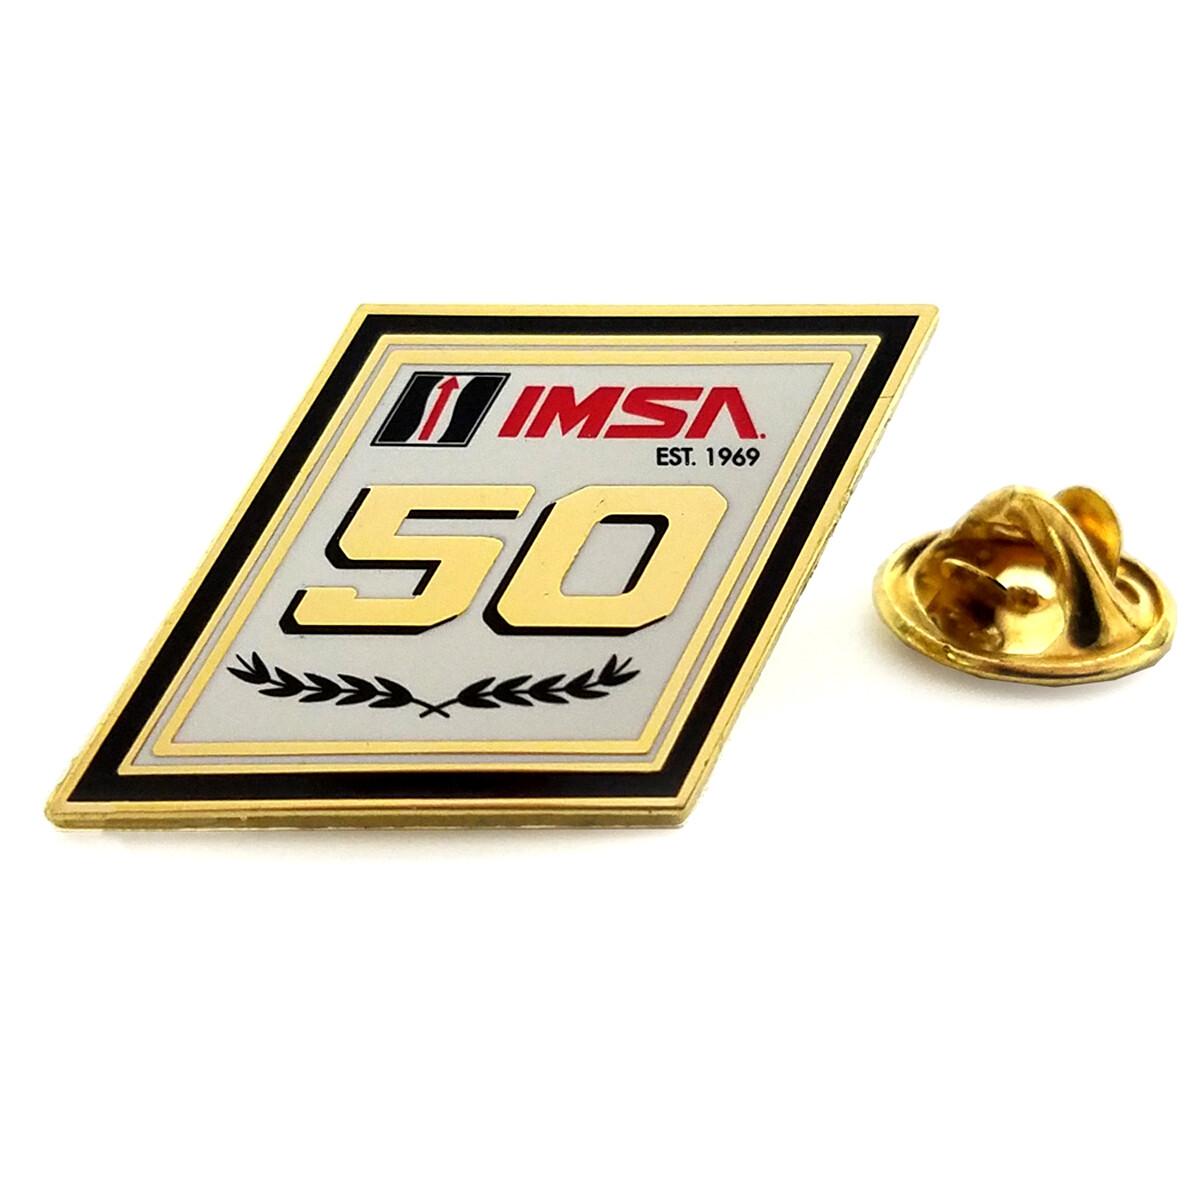 IMSA 50th Anniversary Lapel Pin